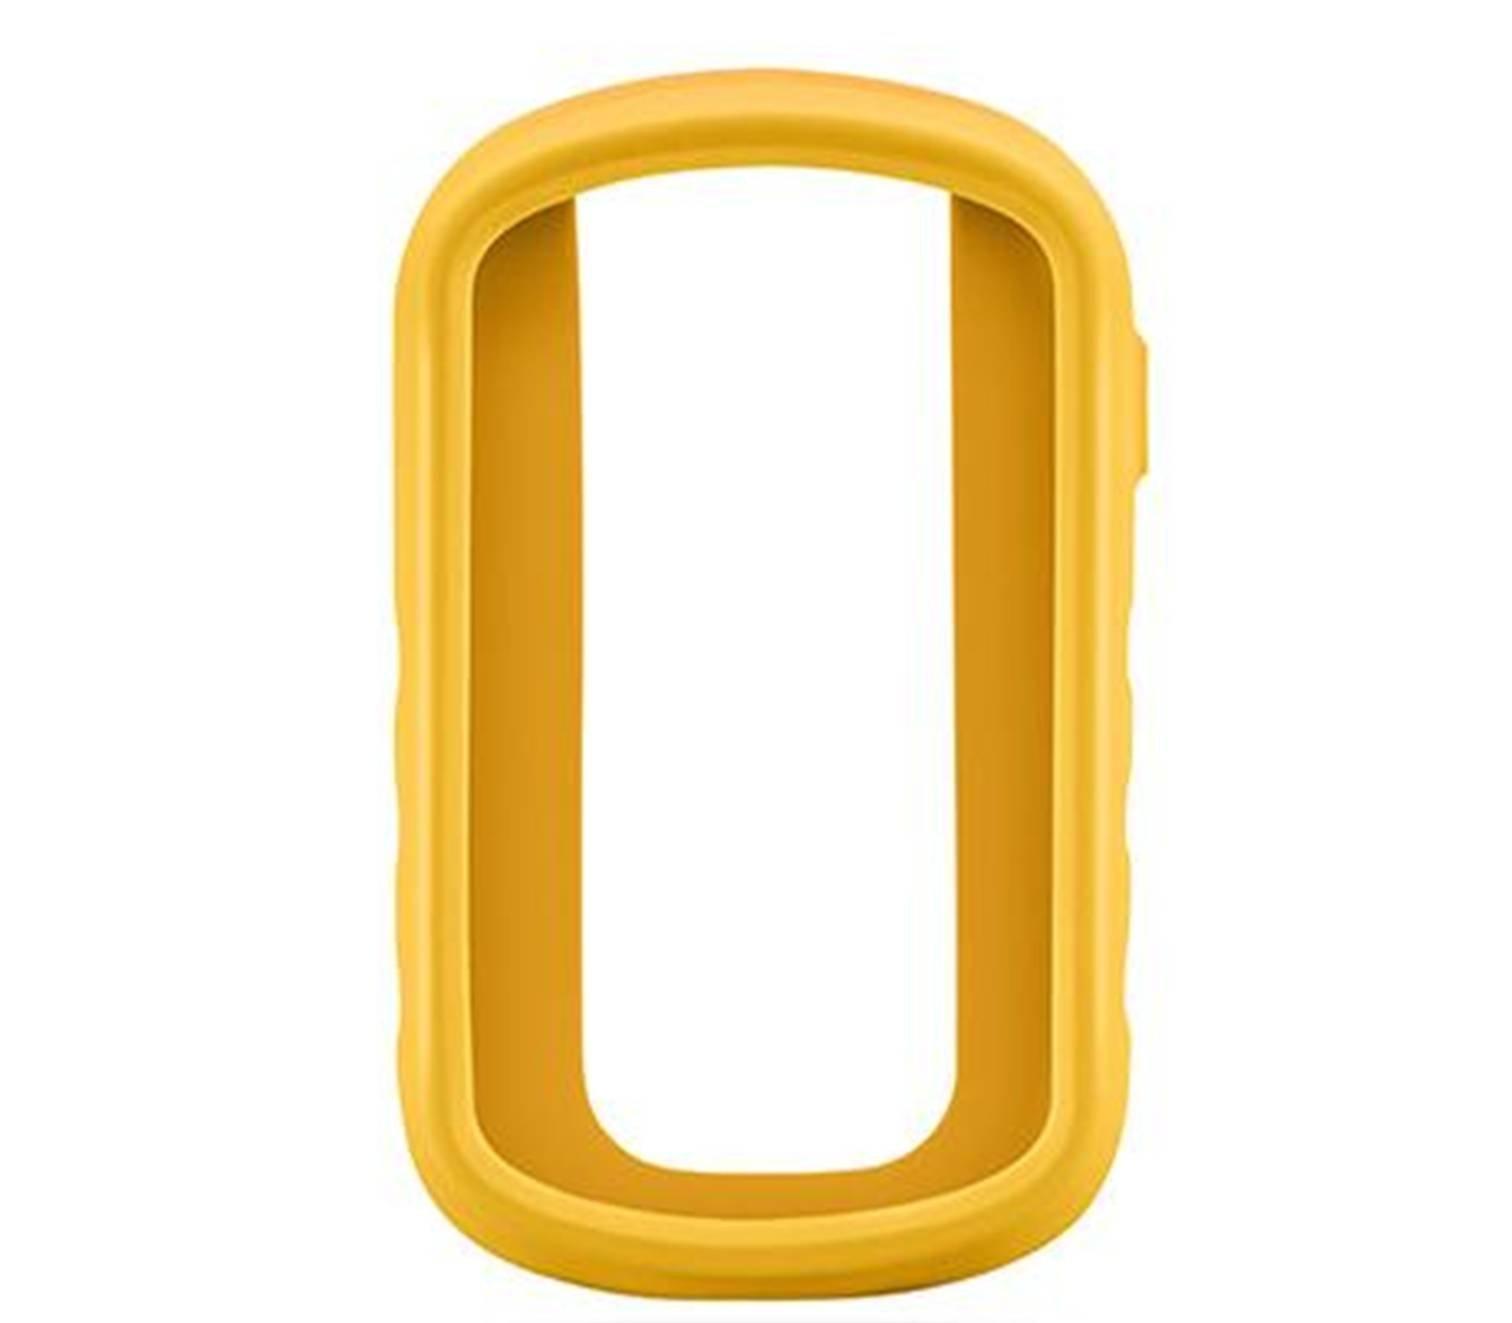 Garmin Silicone Case for eTrex Touch 25/35, Yellow